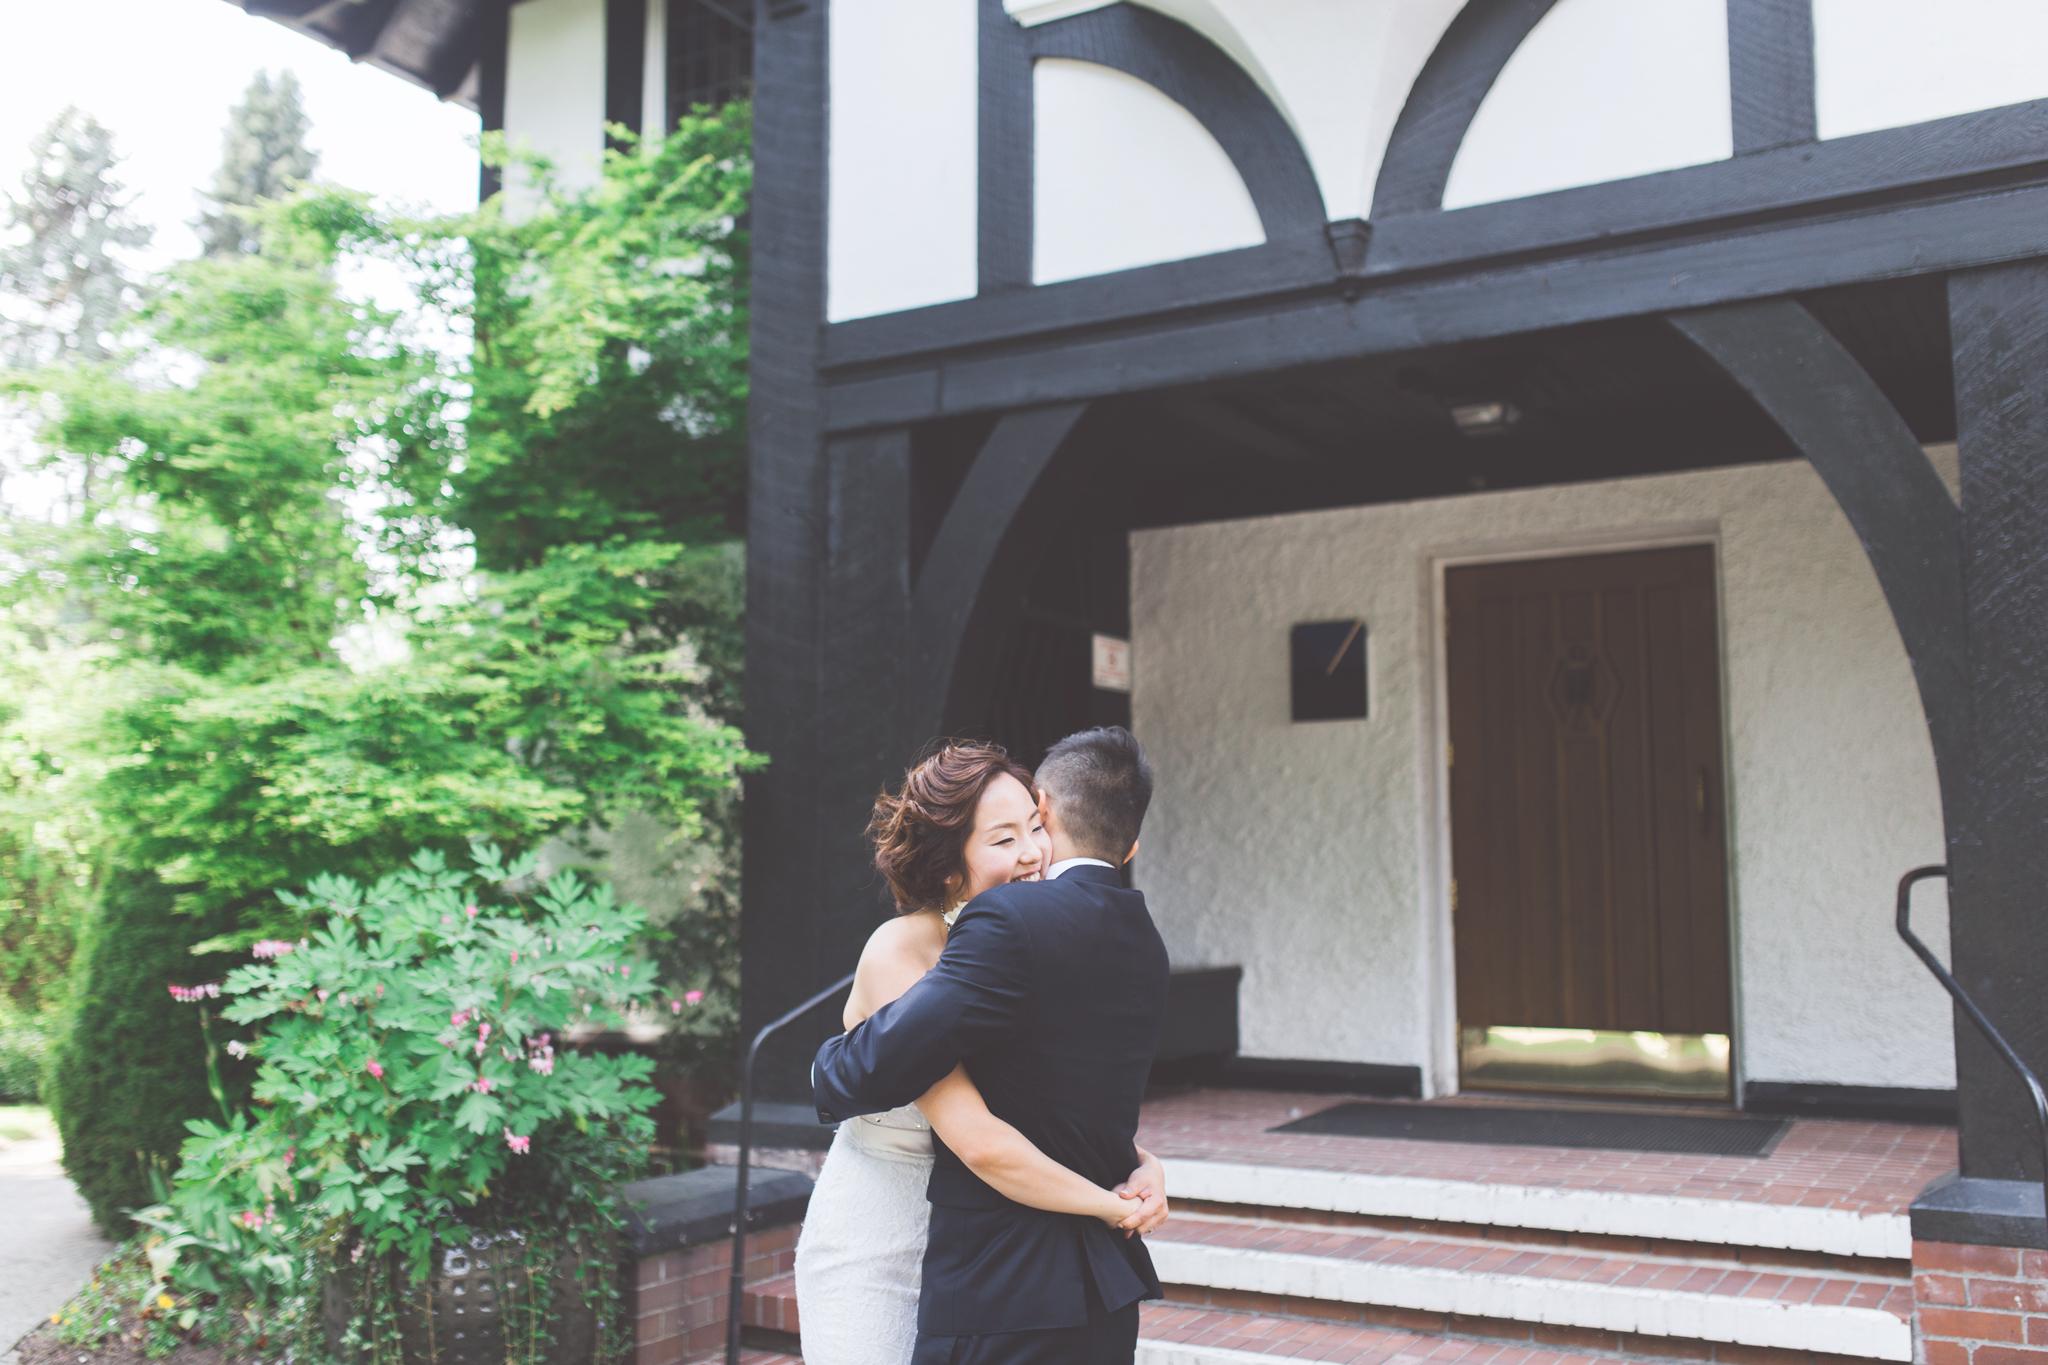 IMG_2724-VANCOUVER-WEDDING-PHOTOGRAPHER-JENNIFER-PICARD-PHOTOGRAPHY-FINE-ART-WEDDINGS.jpg